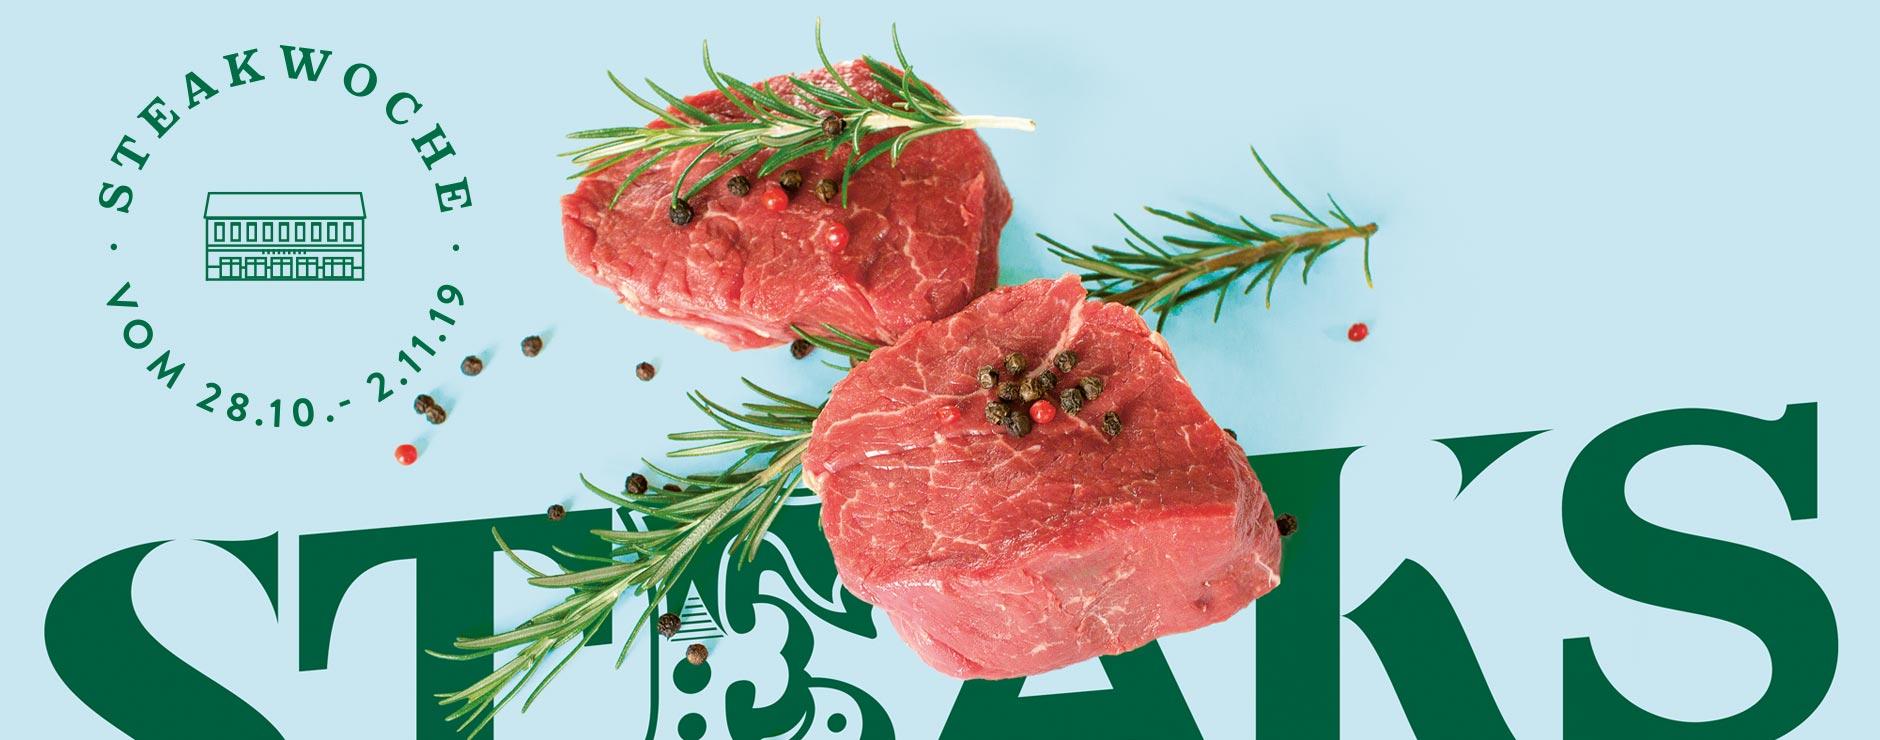 webtitel-steakwoche-19-001